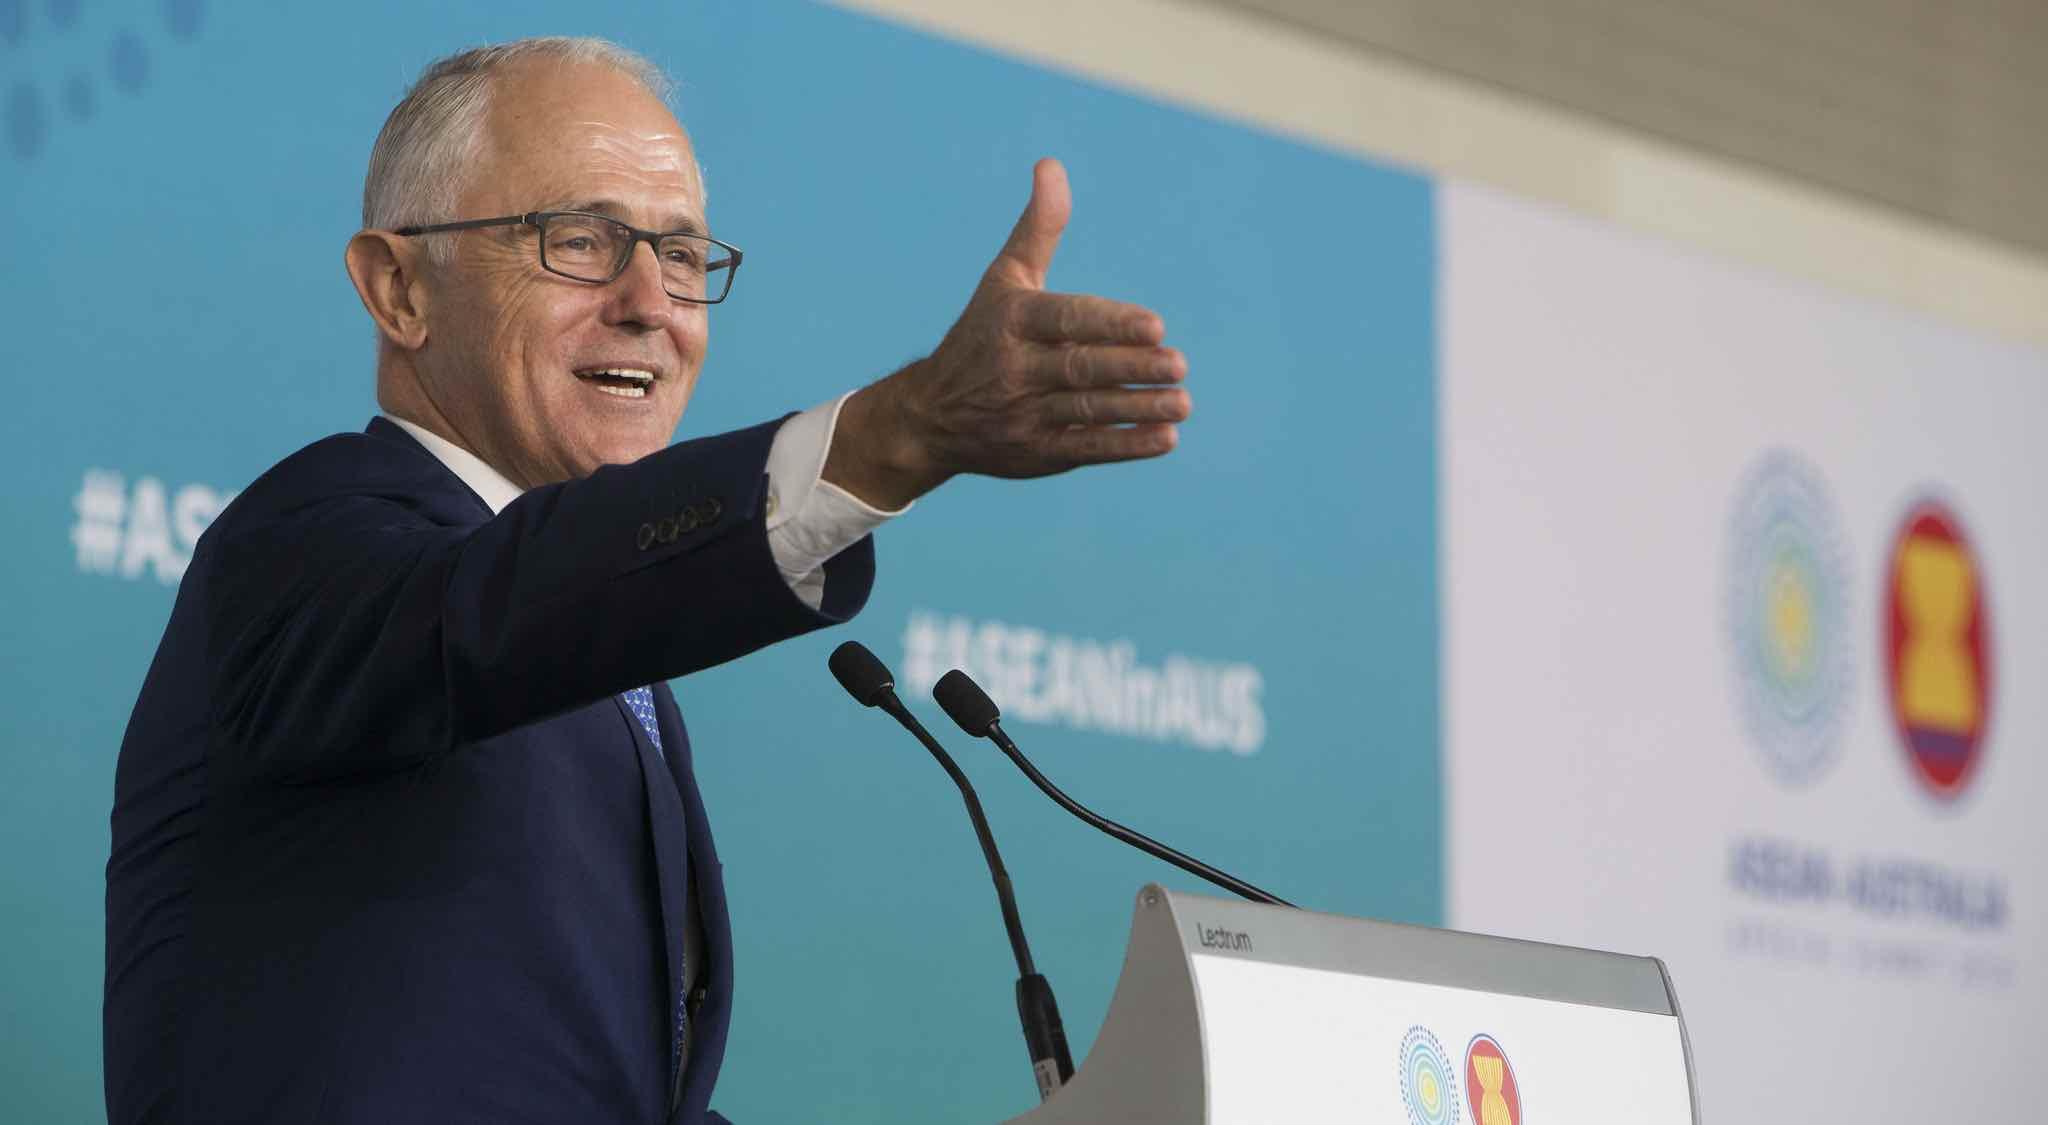 Prime Minister Malcolm Turnbull (Photo: ASEAN-Australia Special Summit 2018/Flickr)